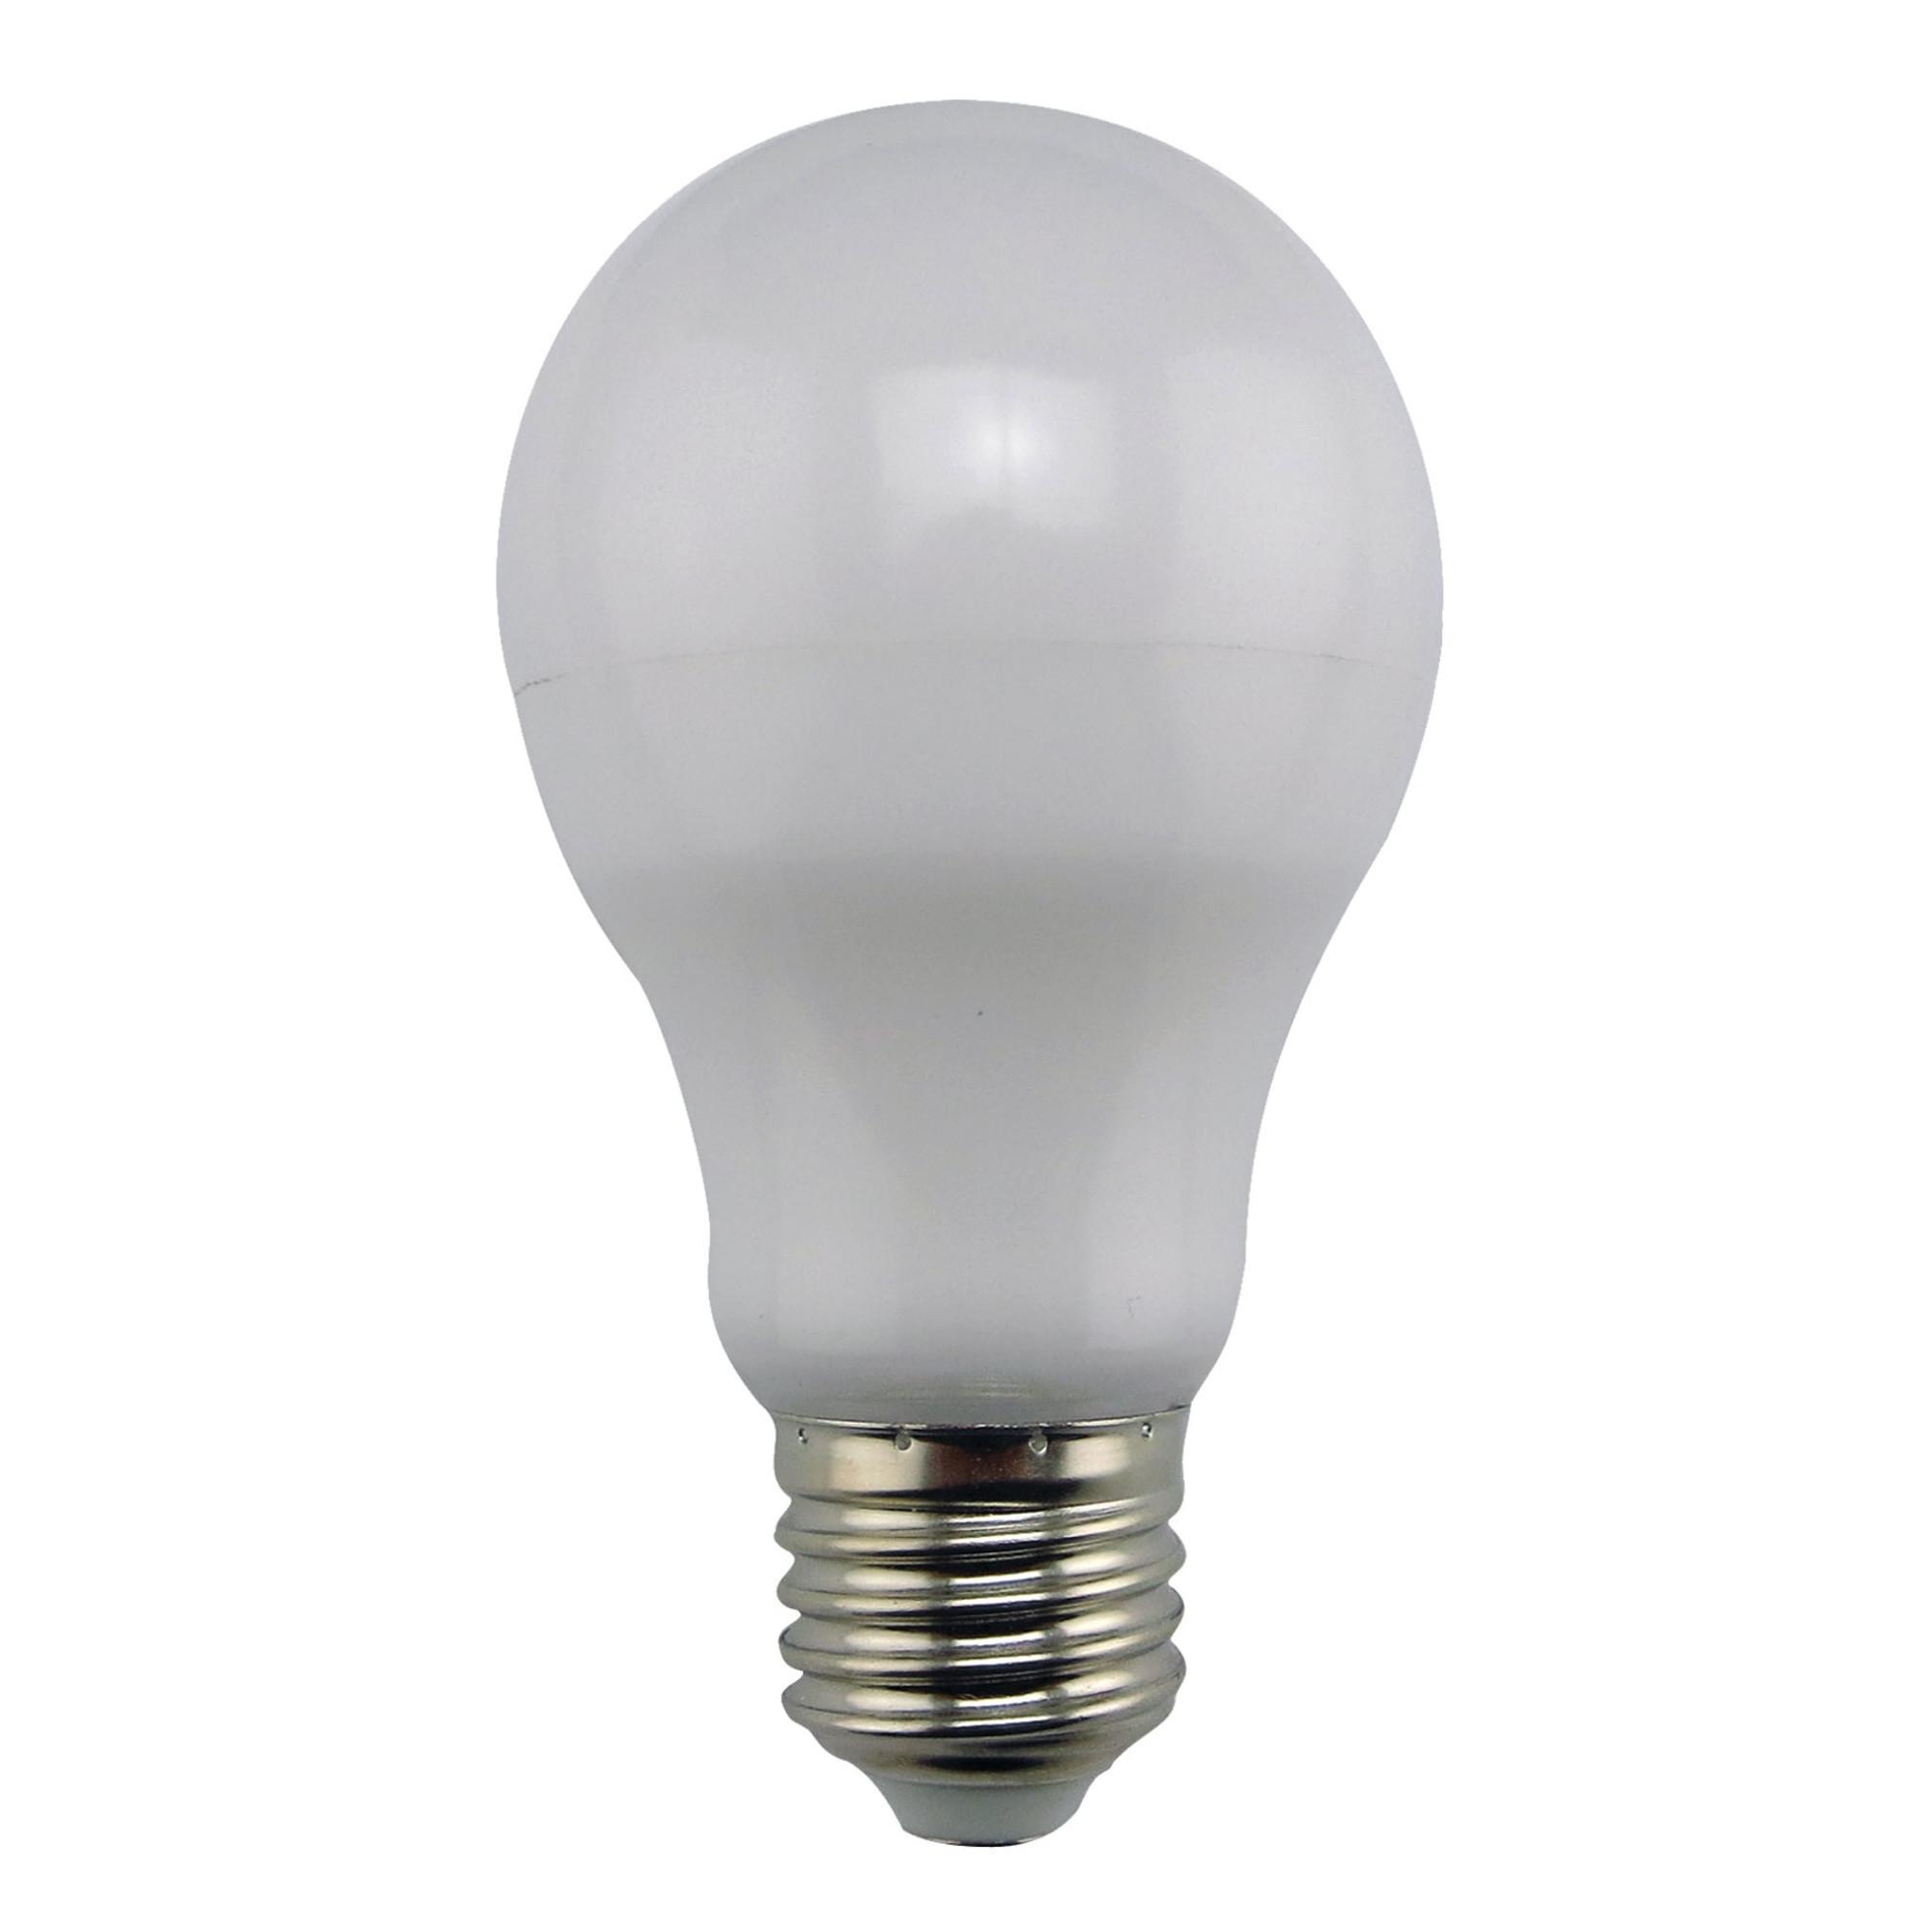 Лампа Ecola Premium светодионая E27 14 Вт груша 1120 Лм теплый свет